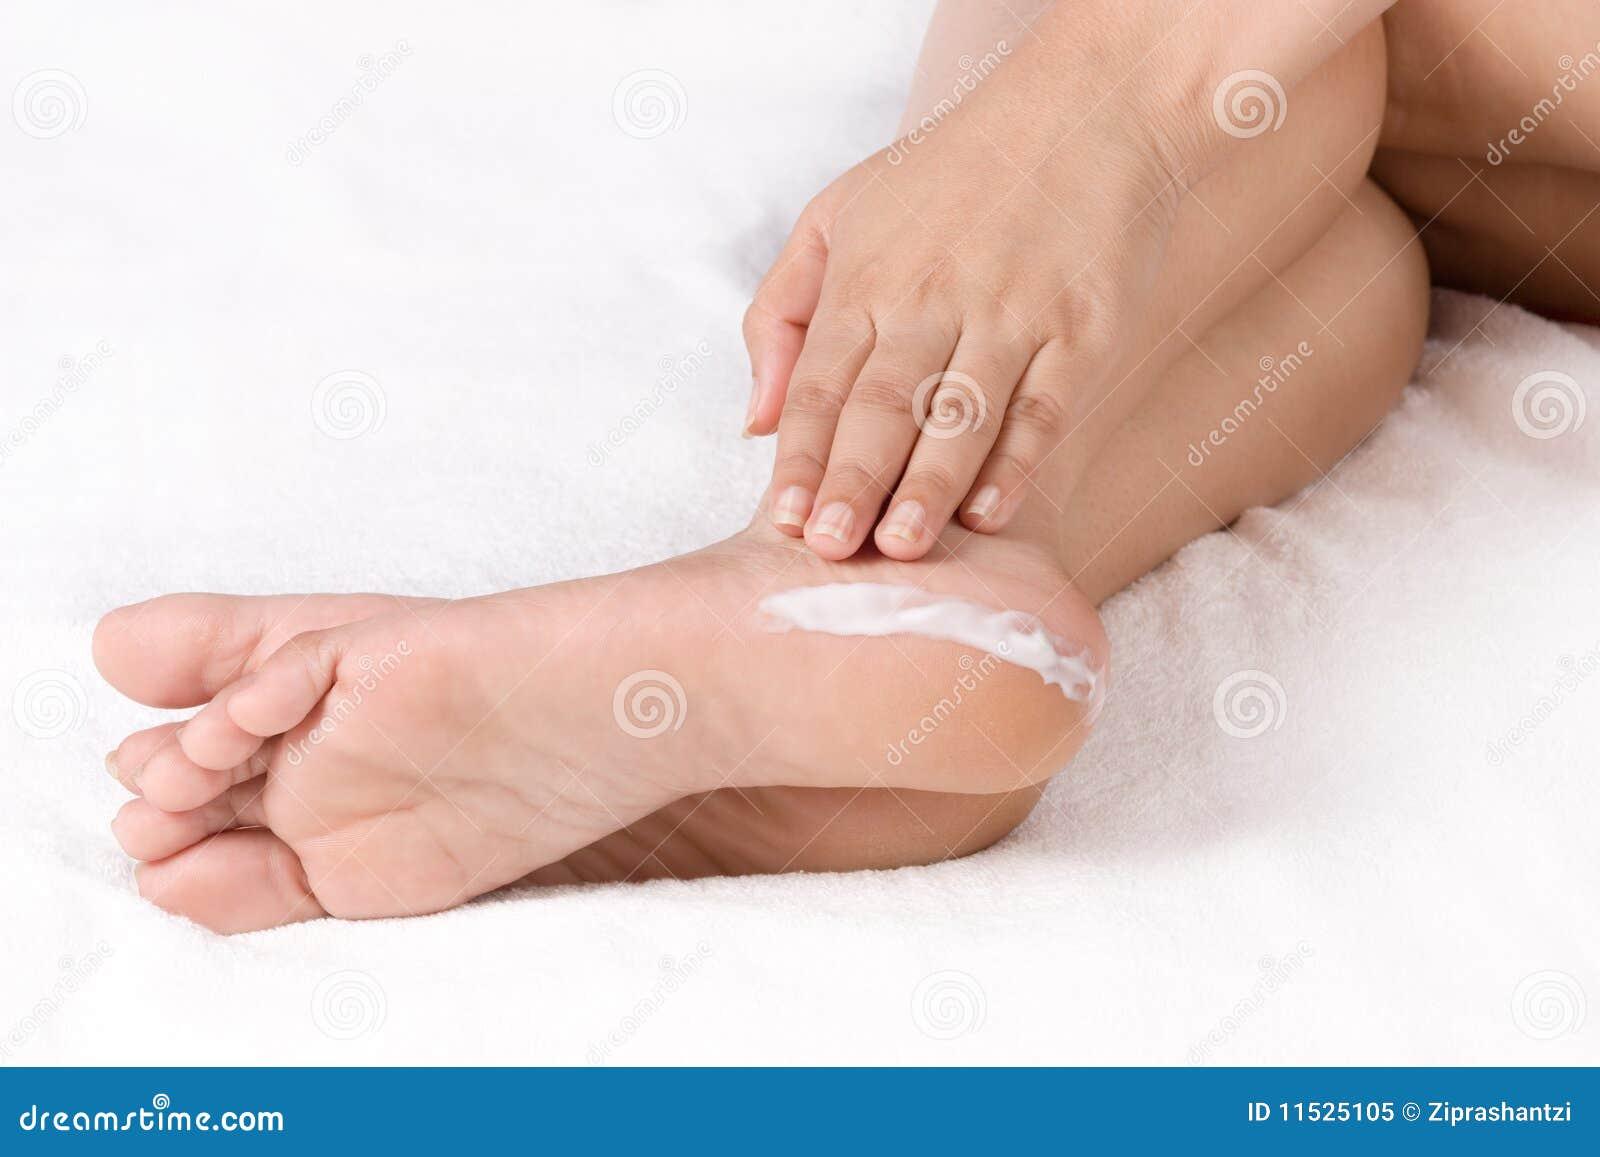 Creamy footjob